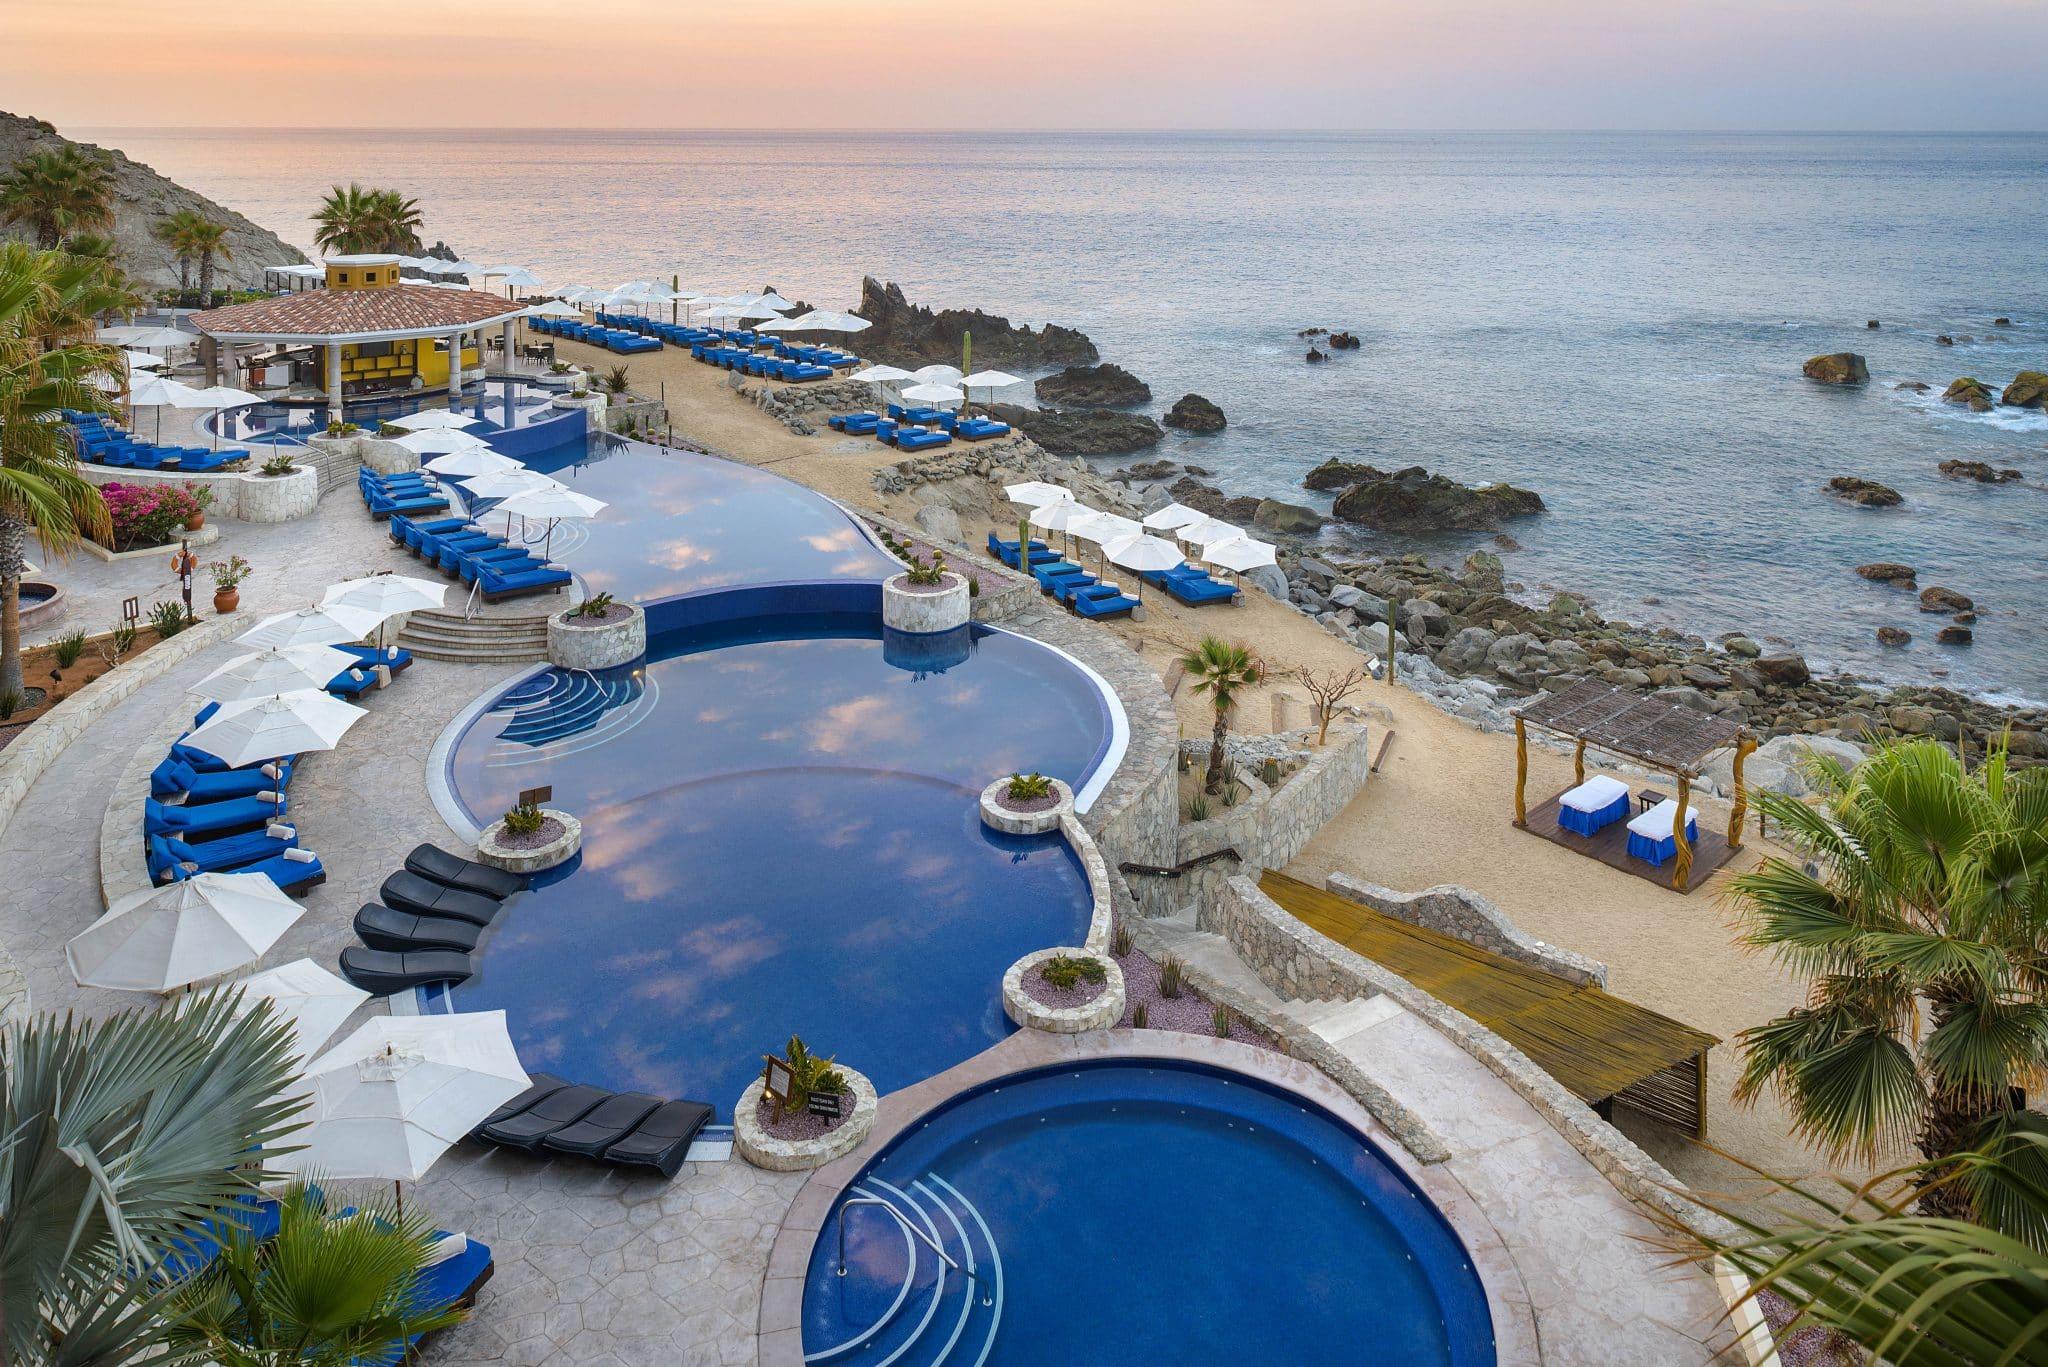 amazing pools at Hacienda Encantada resort